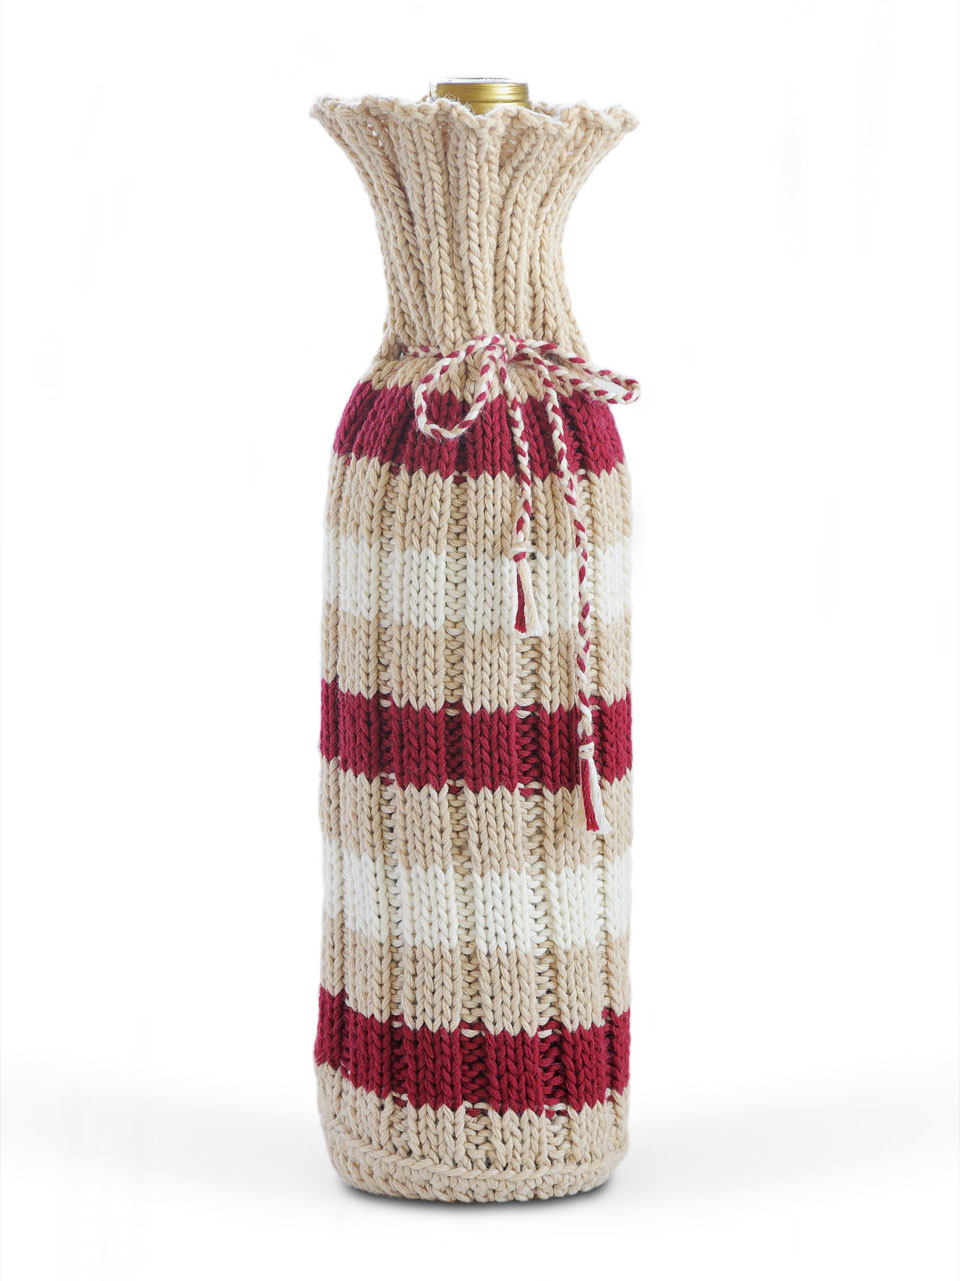 Color Stripes Banding Knit Sweater design wine bottle cover - Buy ...